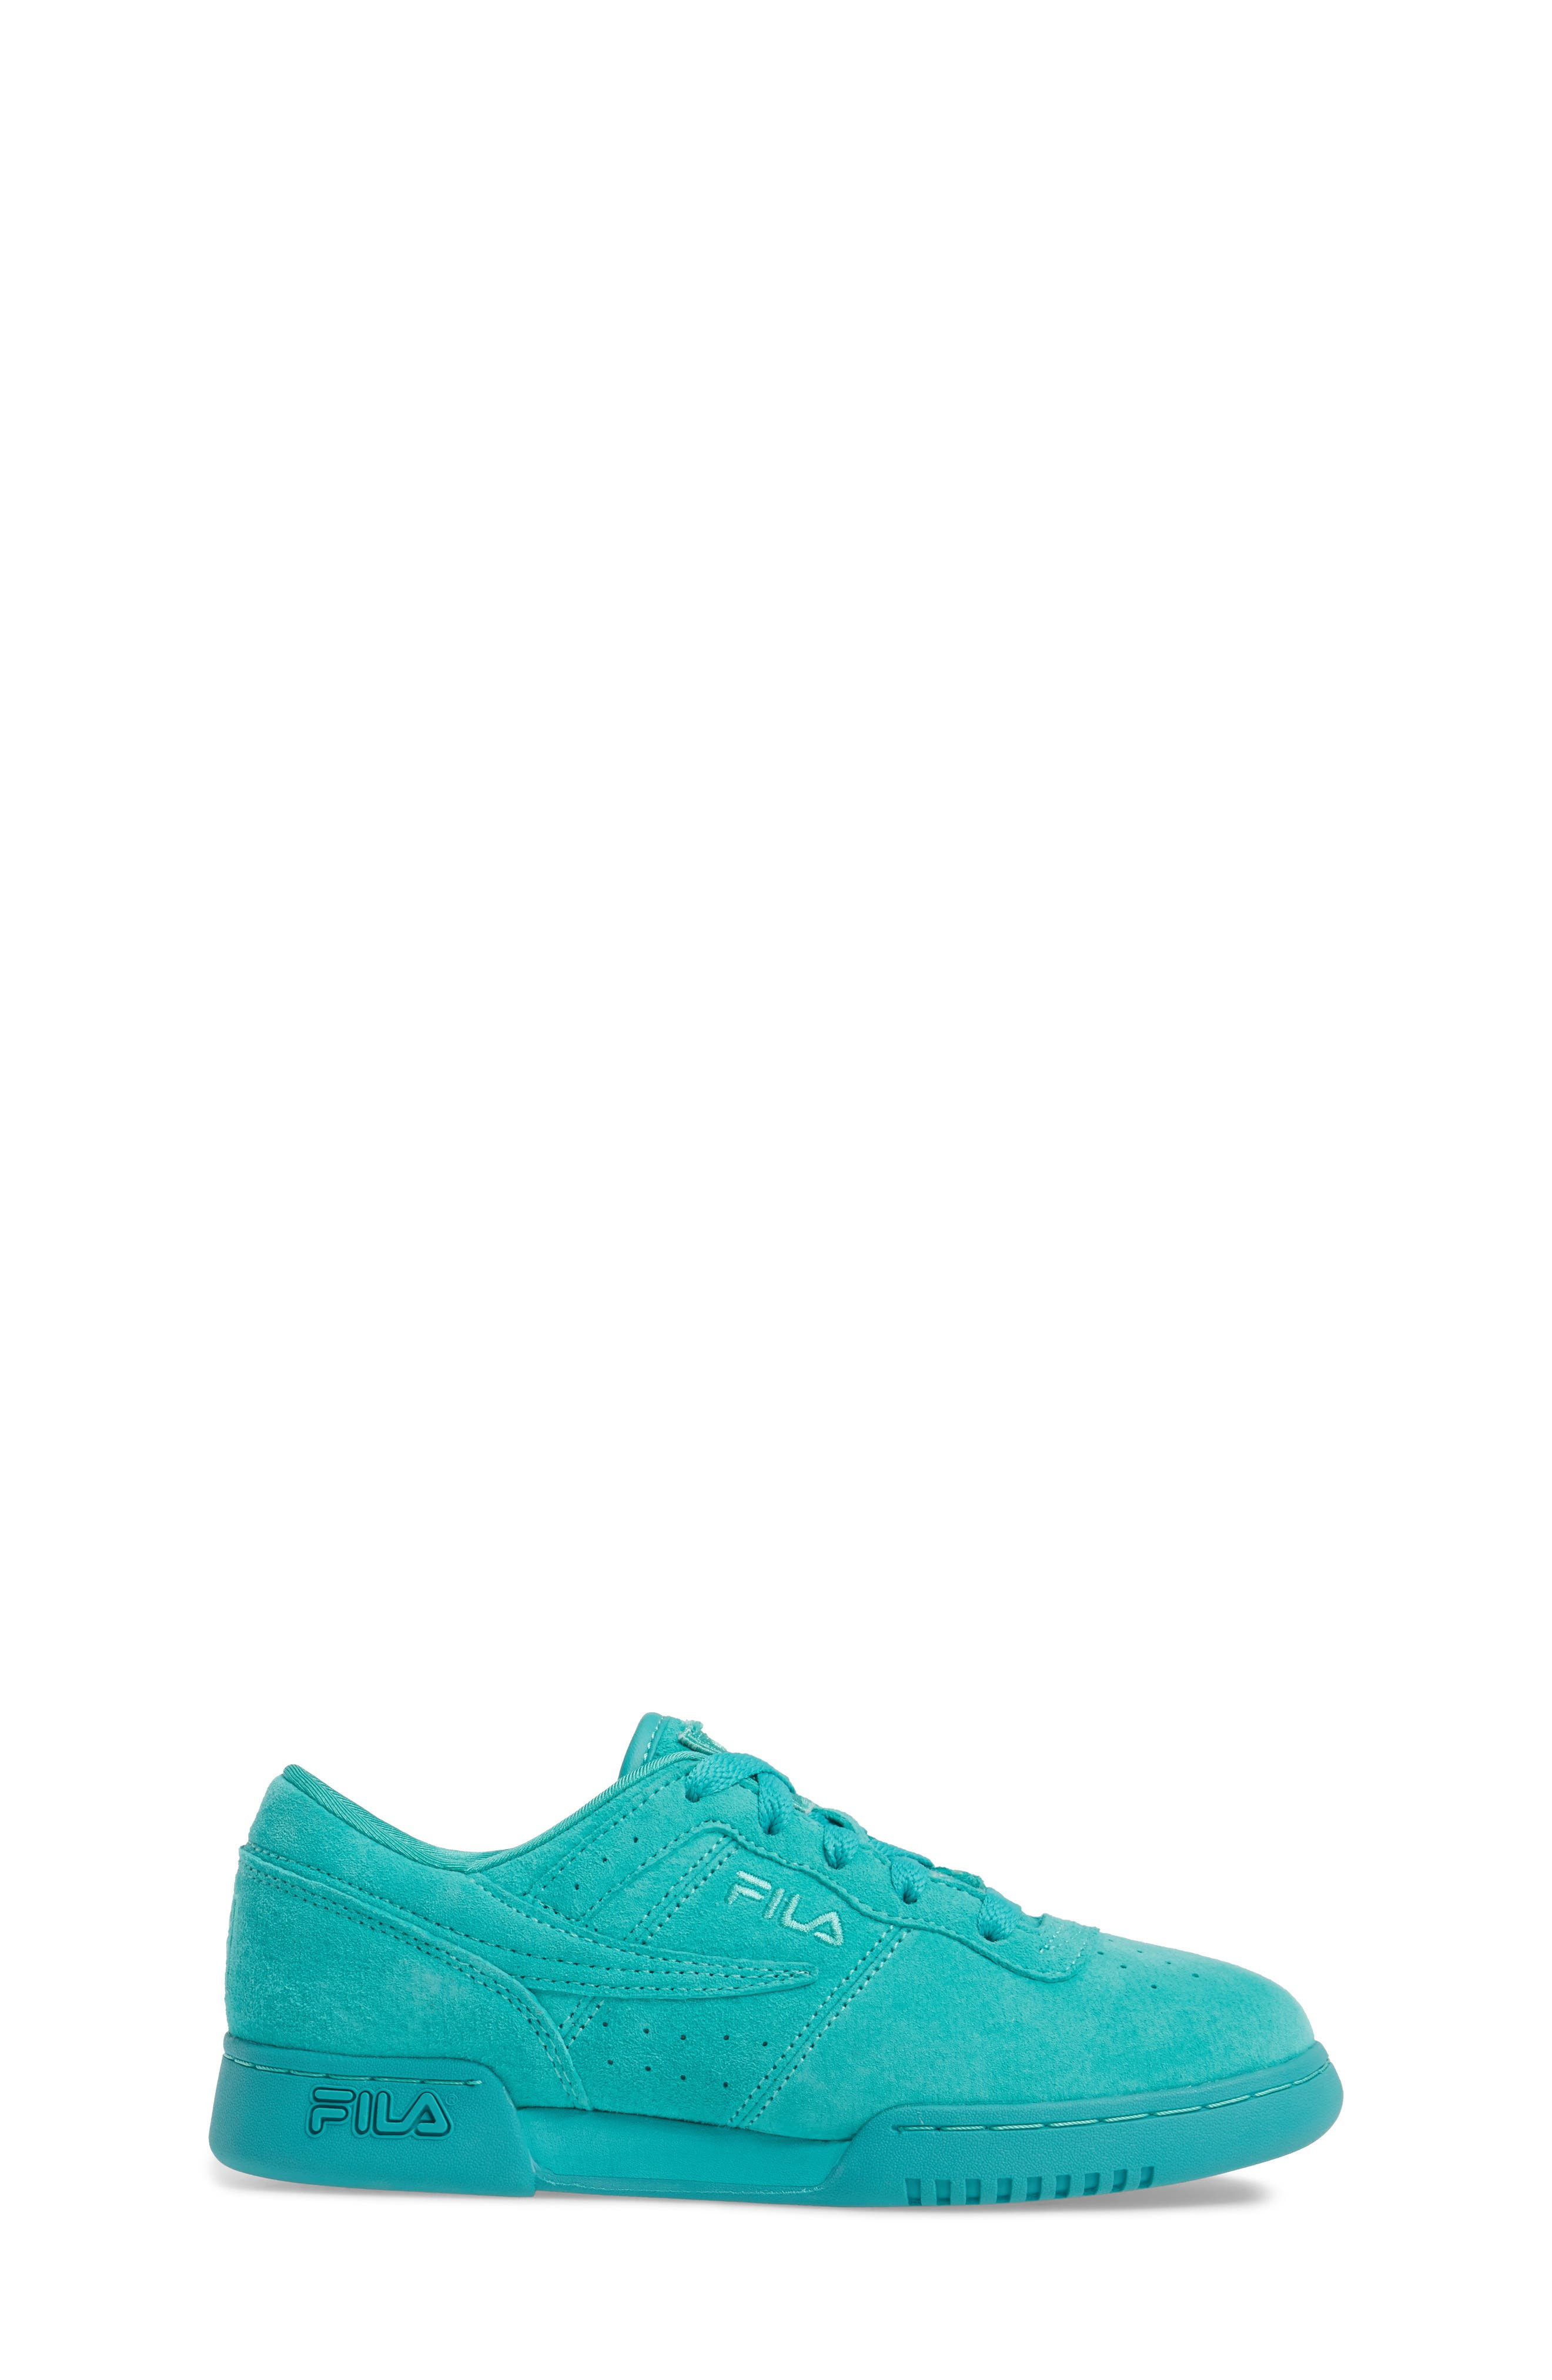 Original Fitness Sneaker,                             Alternate thumbnail 3, color,                             400